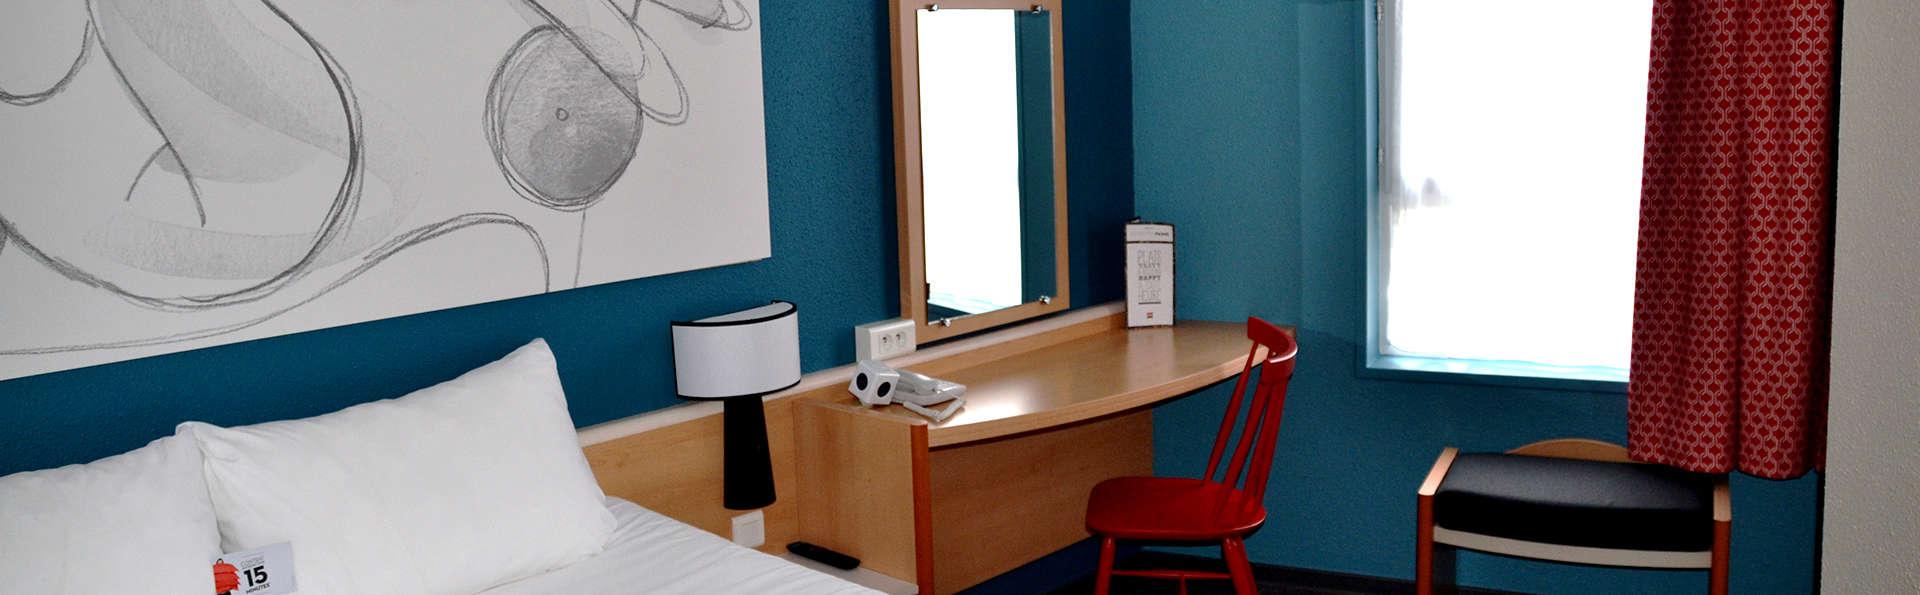 Hôtel Ibis Reims Centre - Edit_Room.jpg